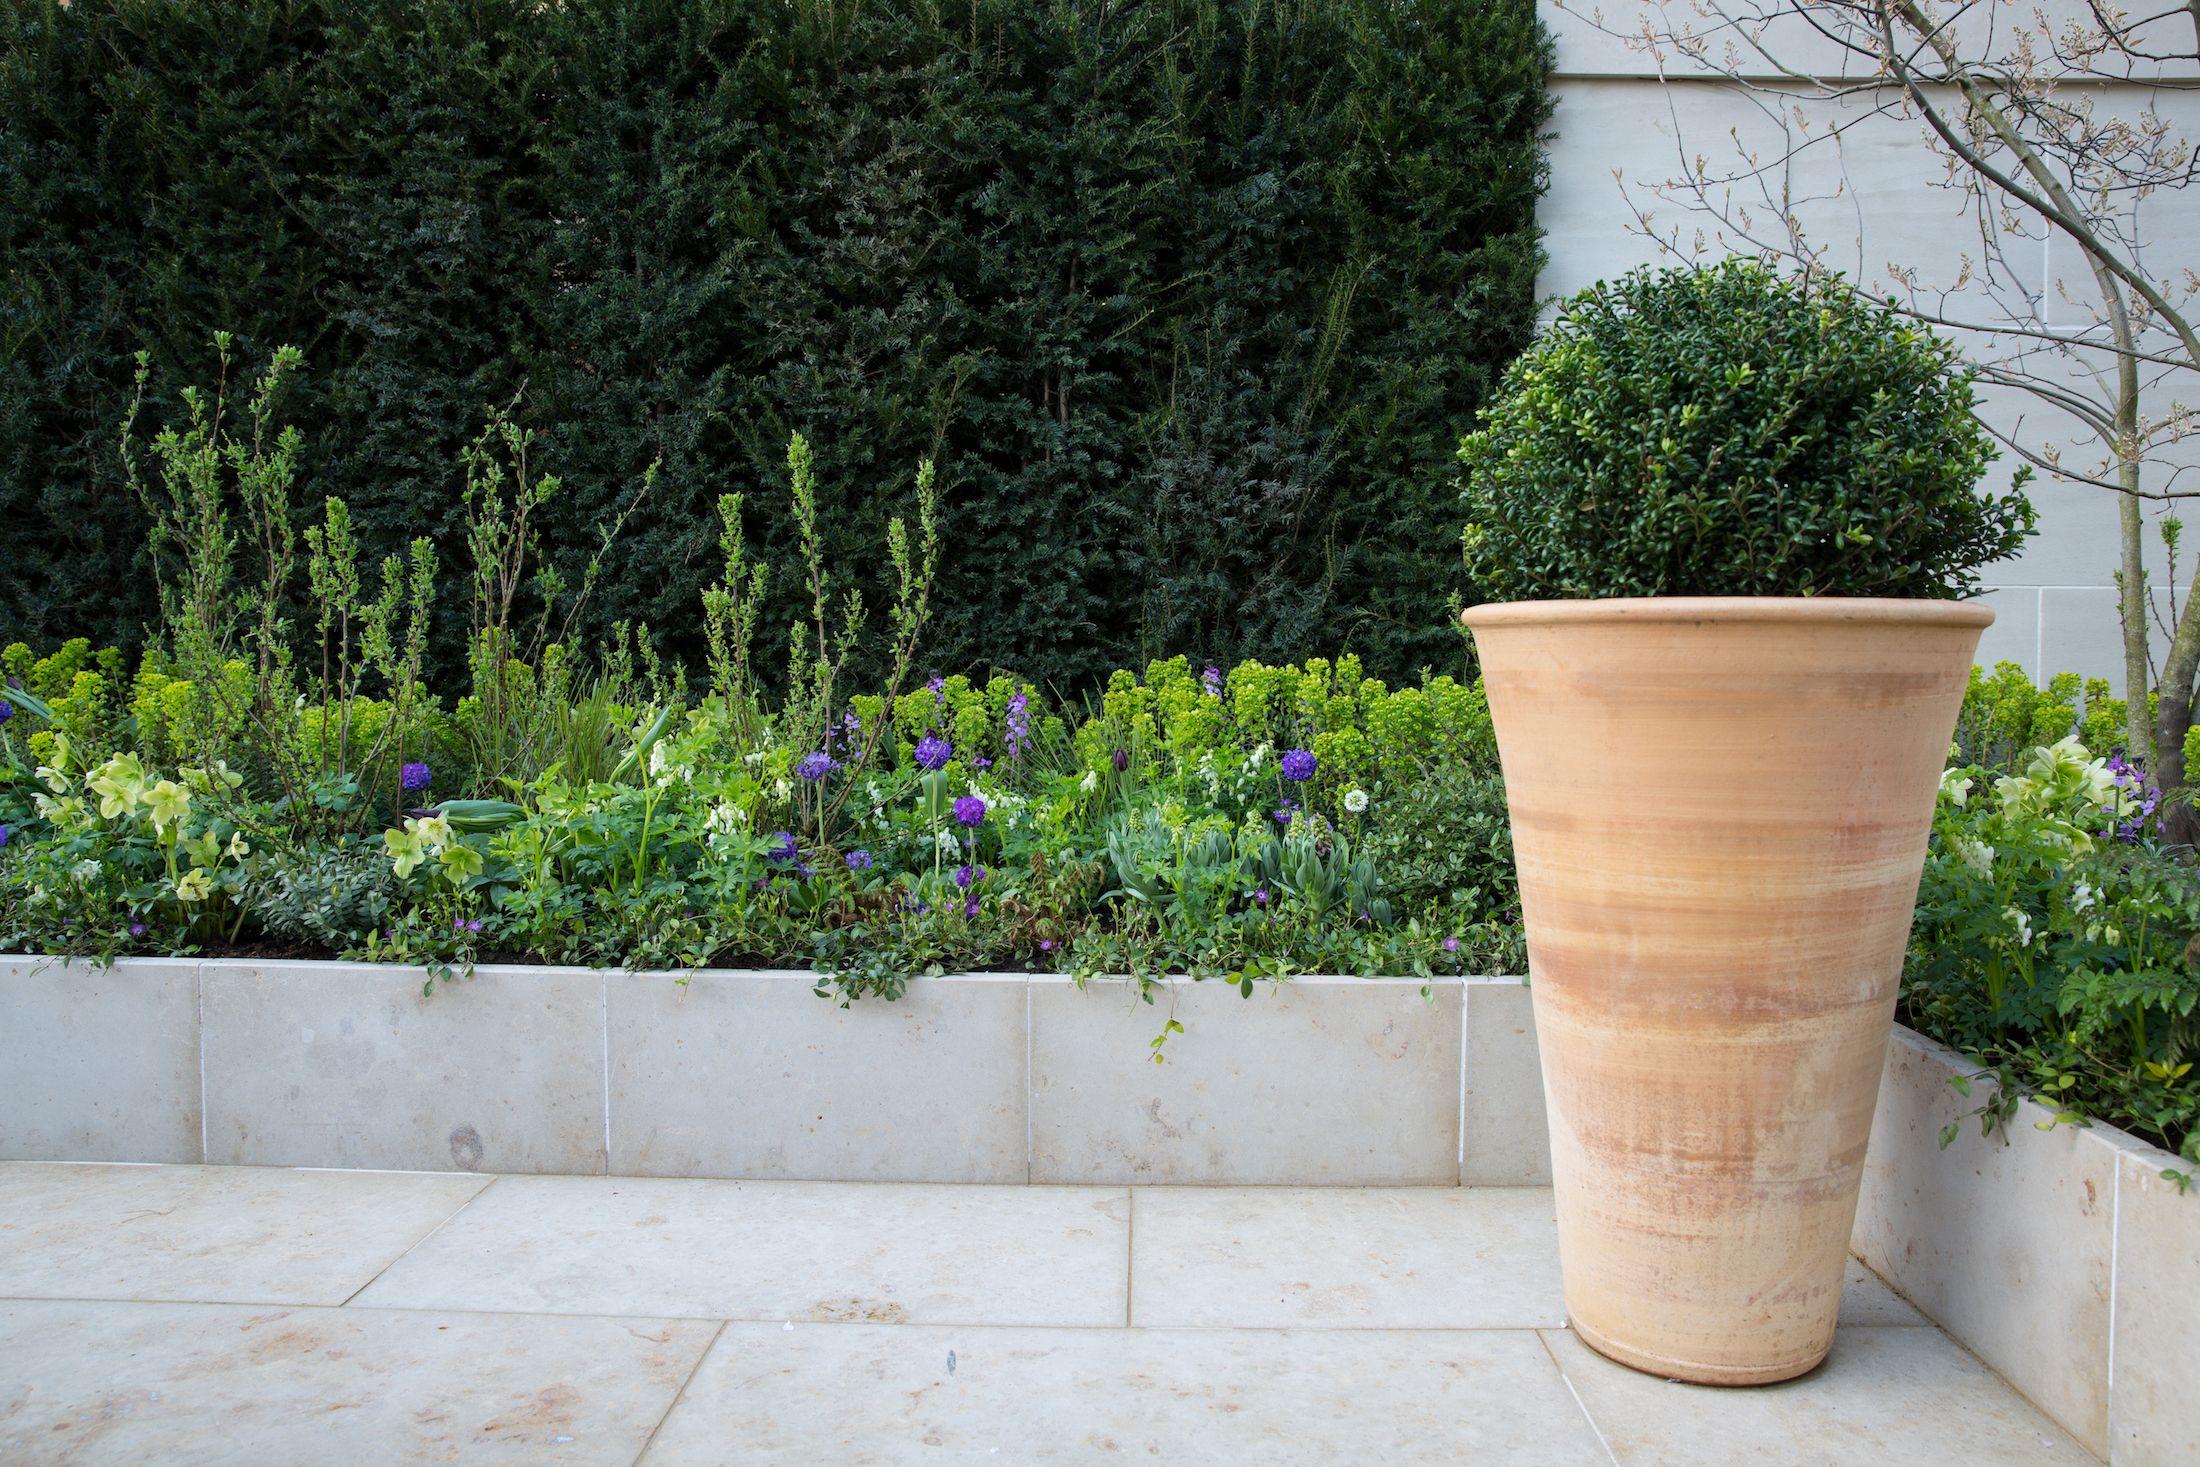 Garden Edging Ideas Garden Border Edging Tips From A Landscaper